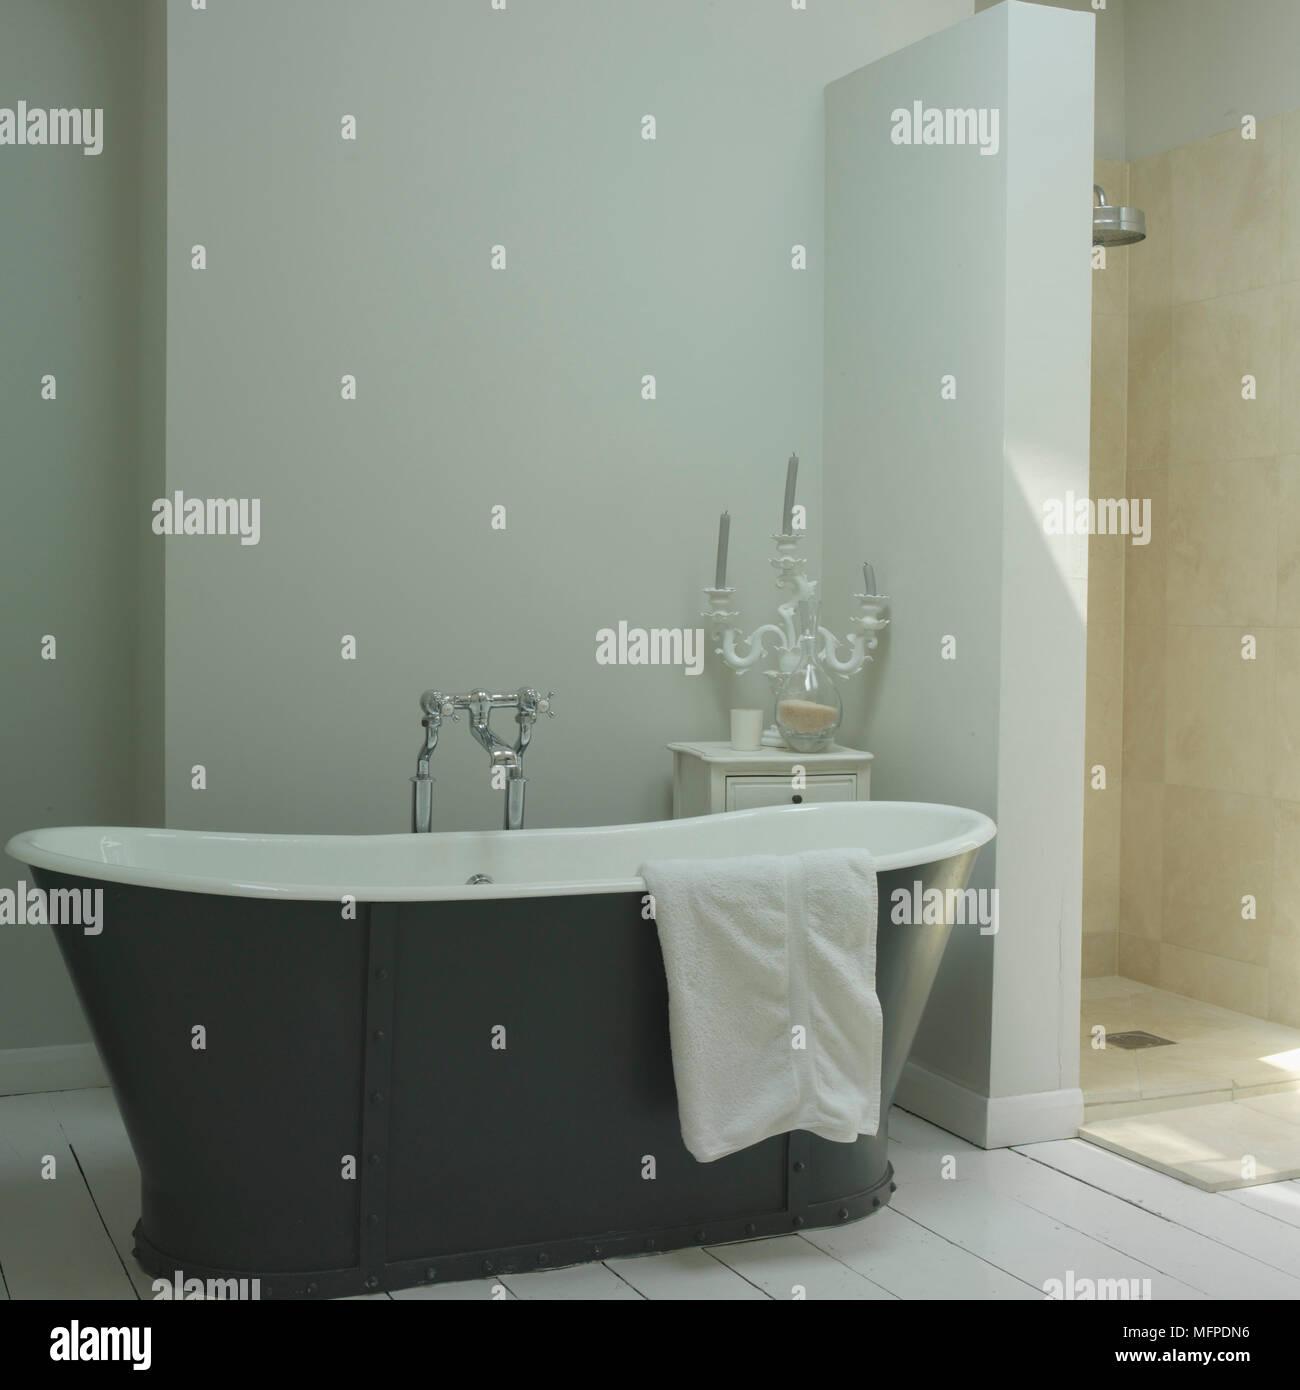 A bathroom with a traditional style bathtub, shower unit, ornate ...